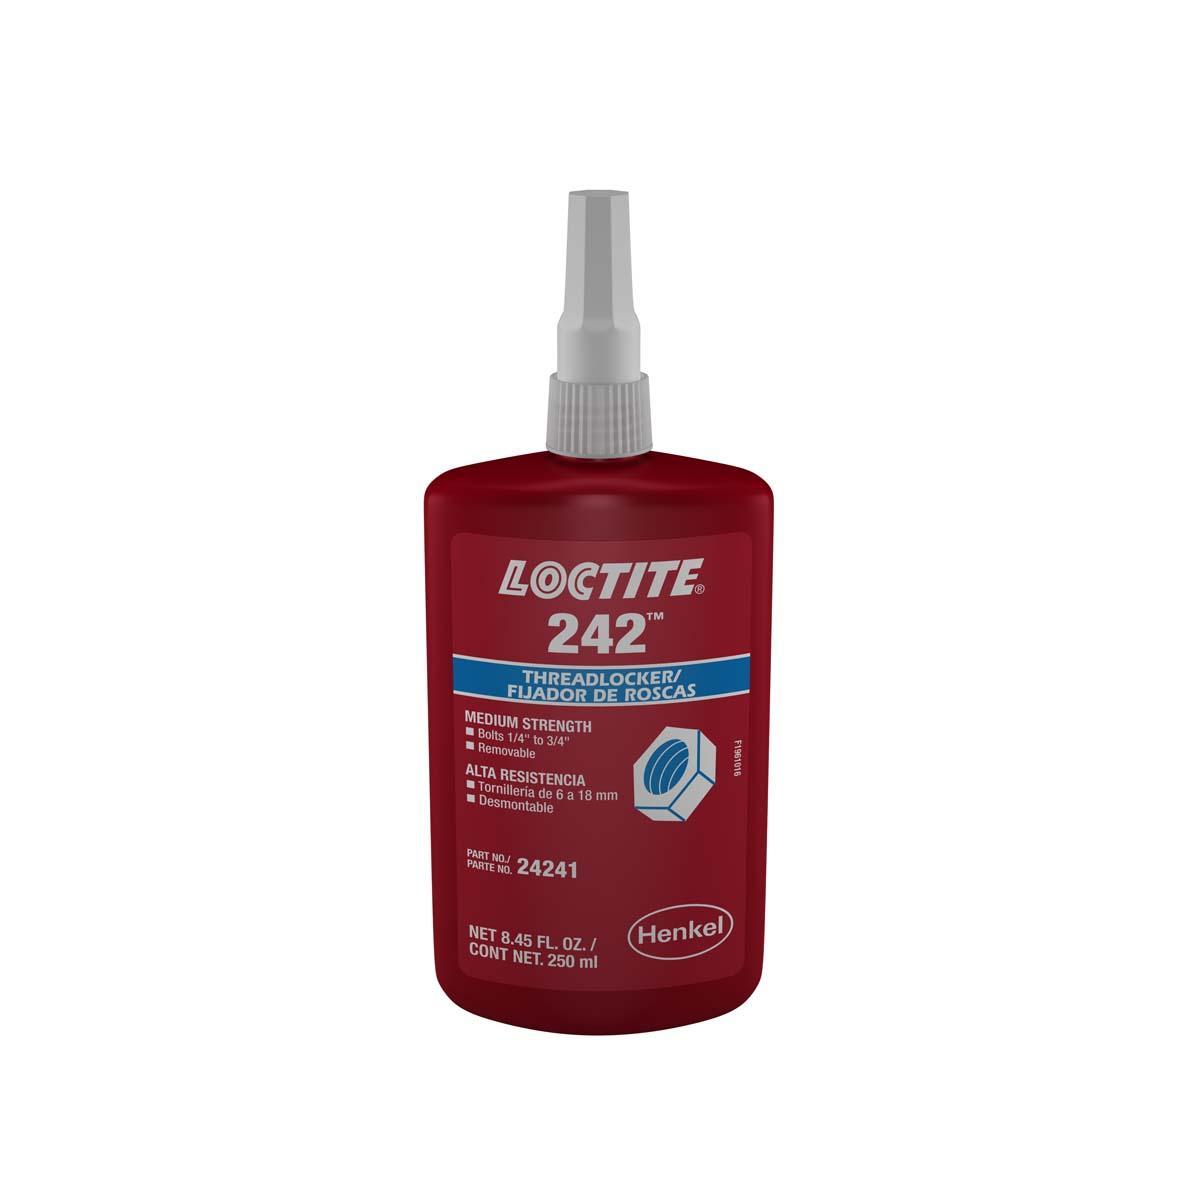 Loctite 242 Medium Strength Threadlocker